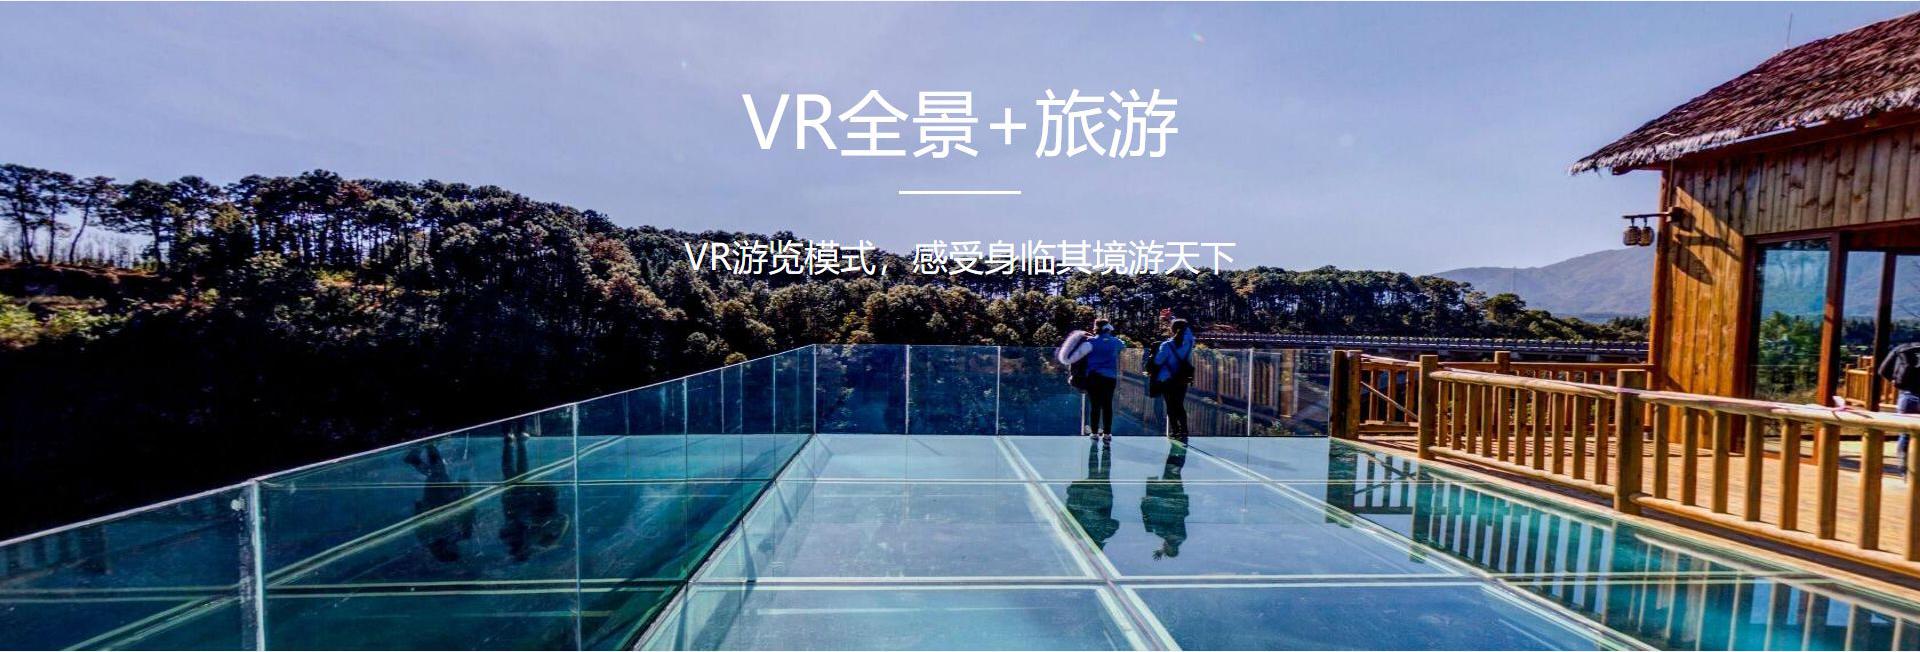 VR全景拍摄